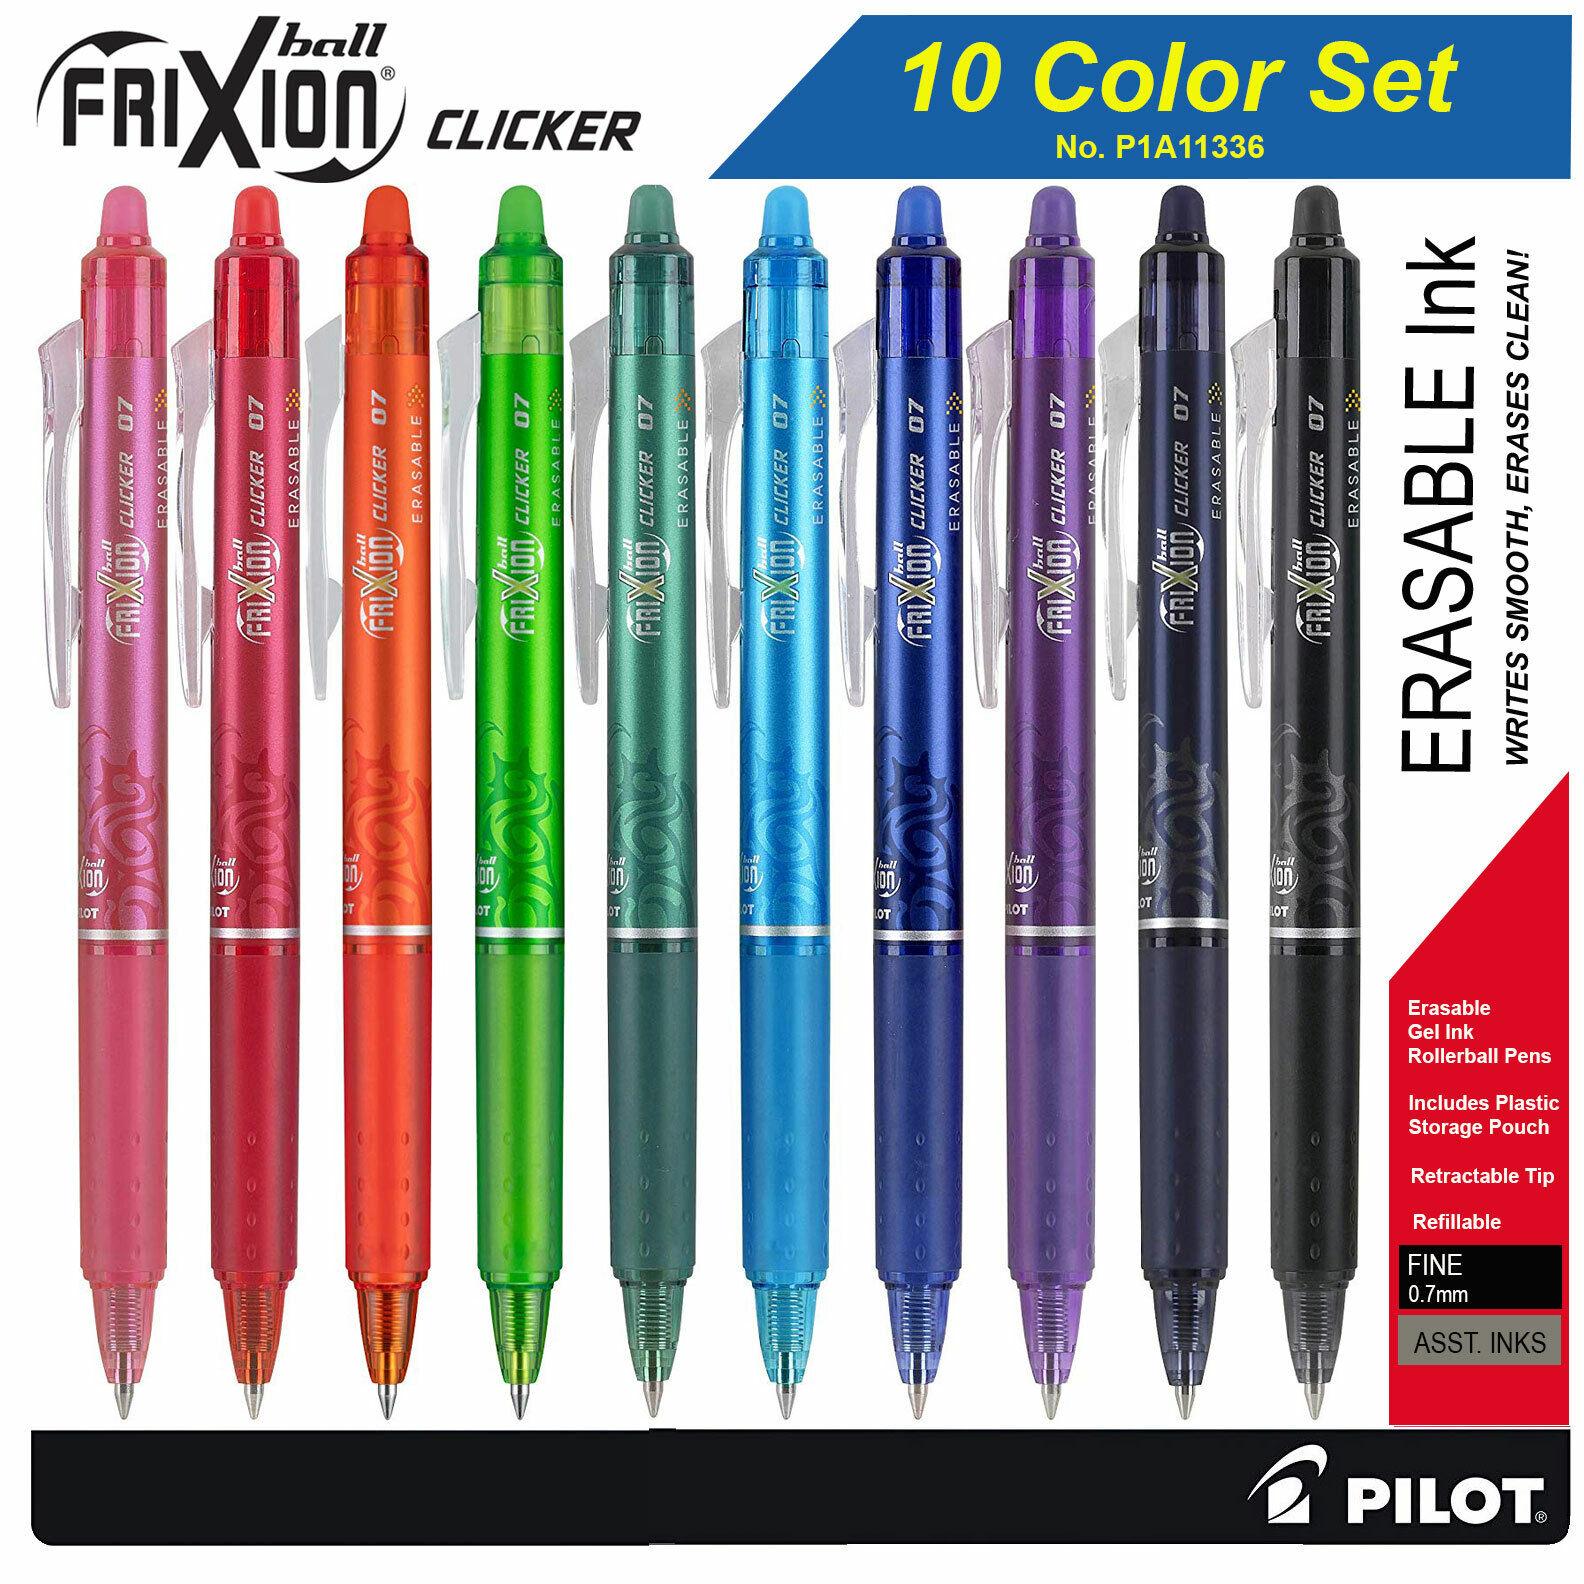 Pilot FriXion Clicker 07 11336 Retractable Erasable Gel Ink